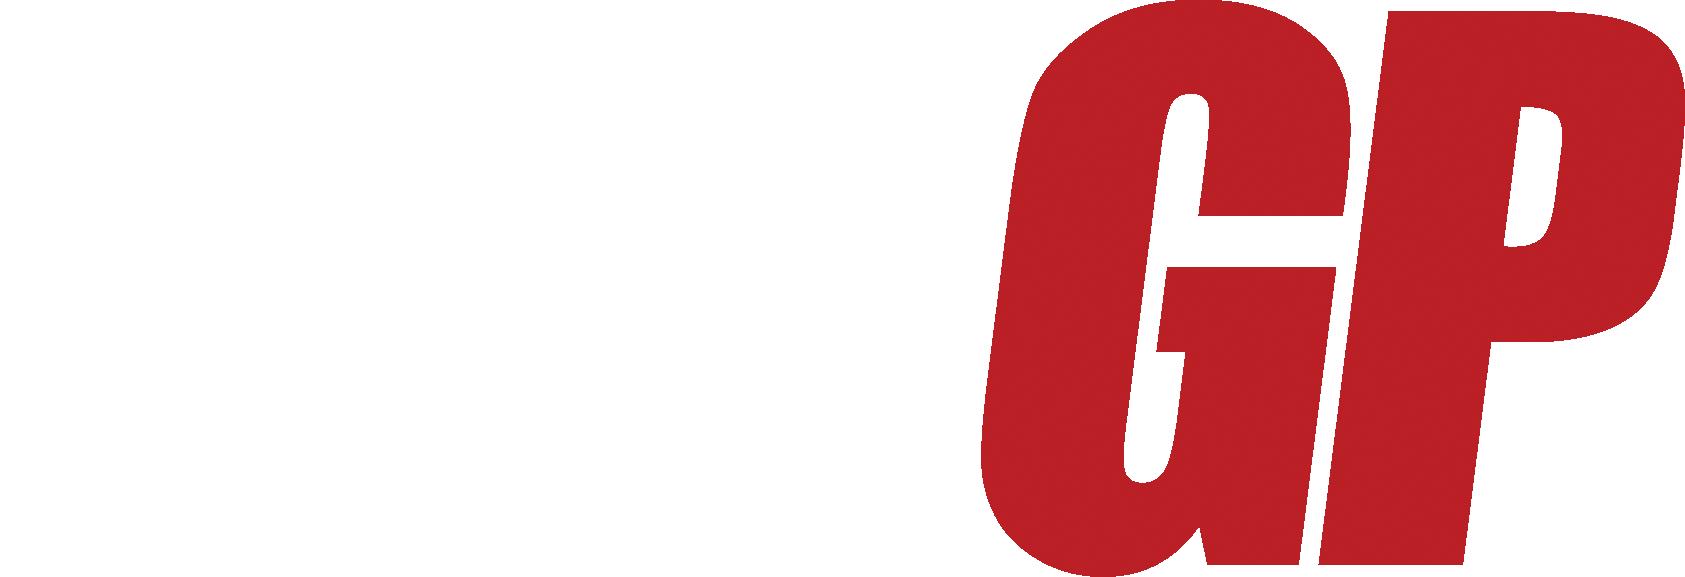 MAGP – Racing